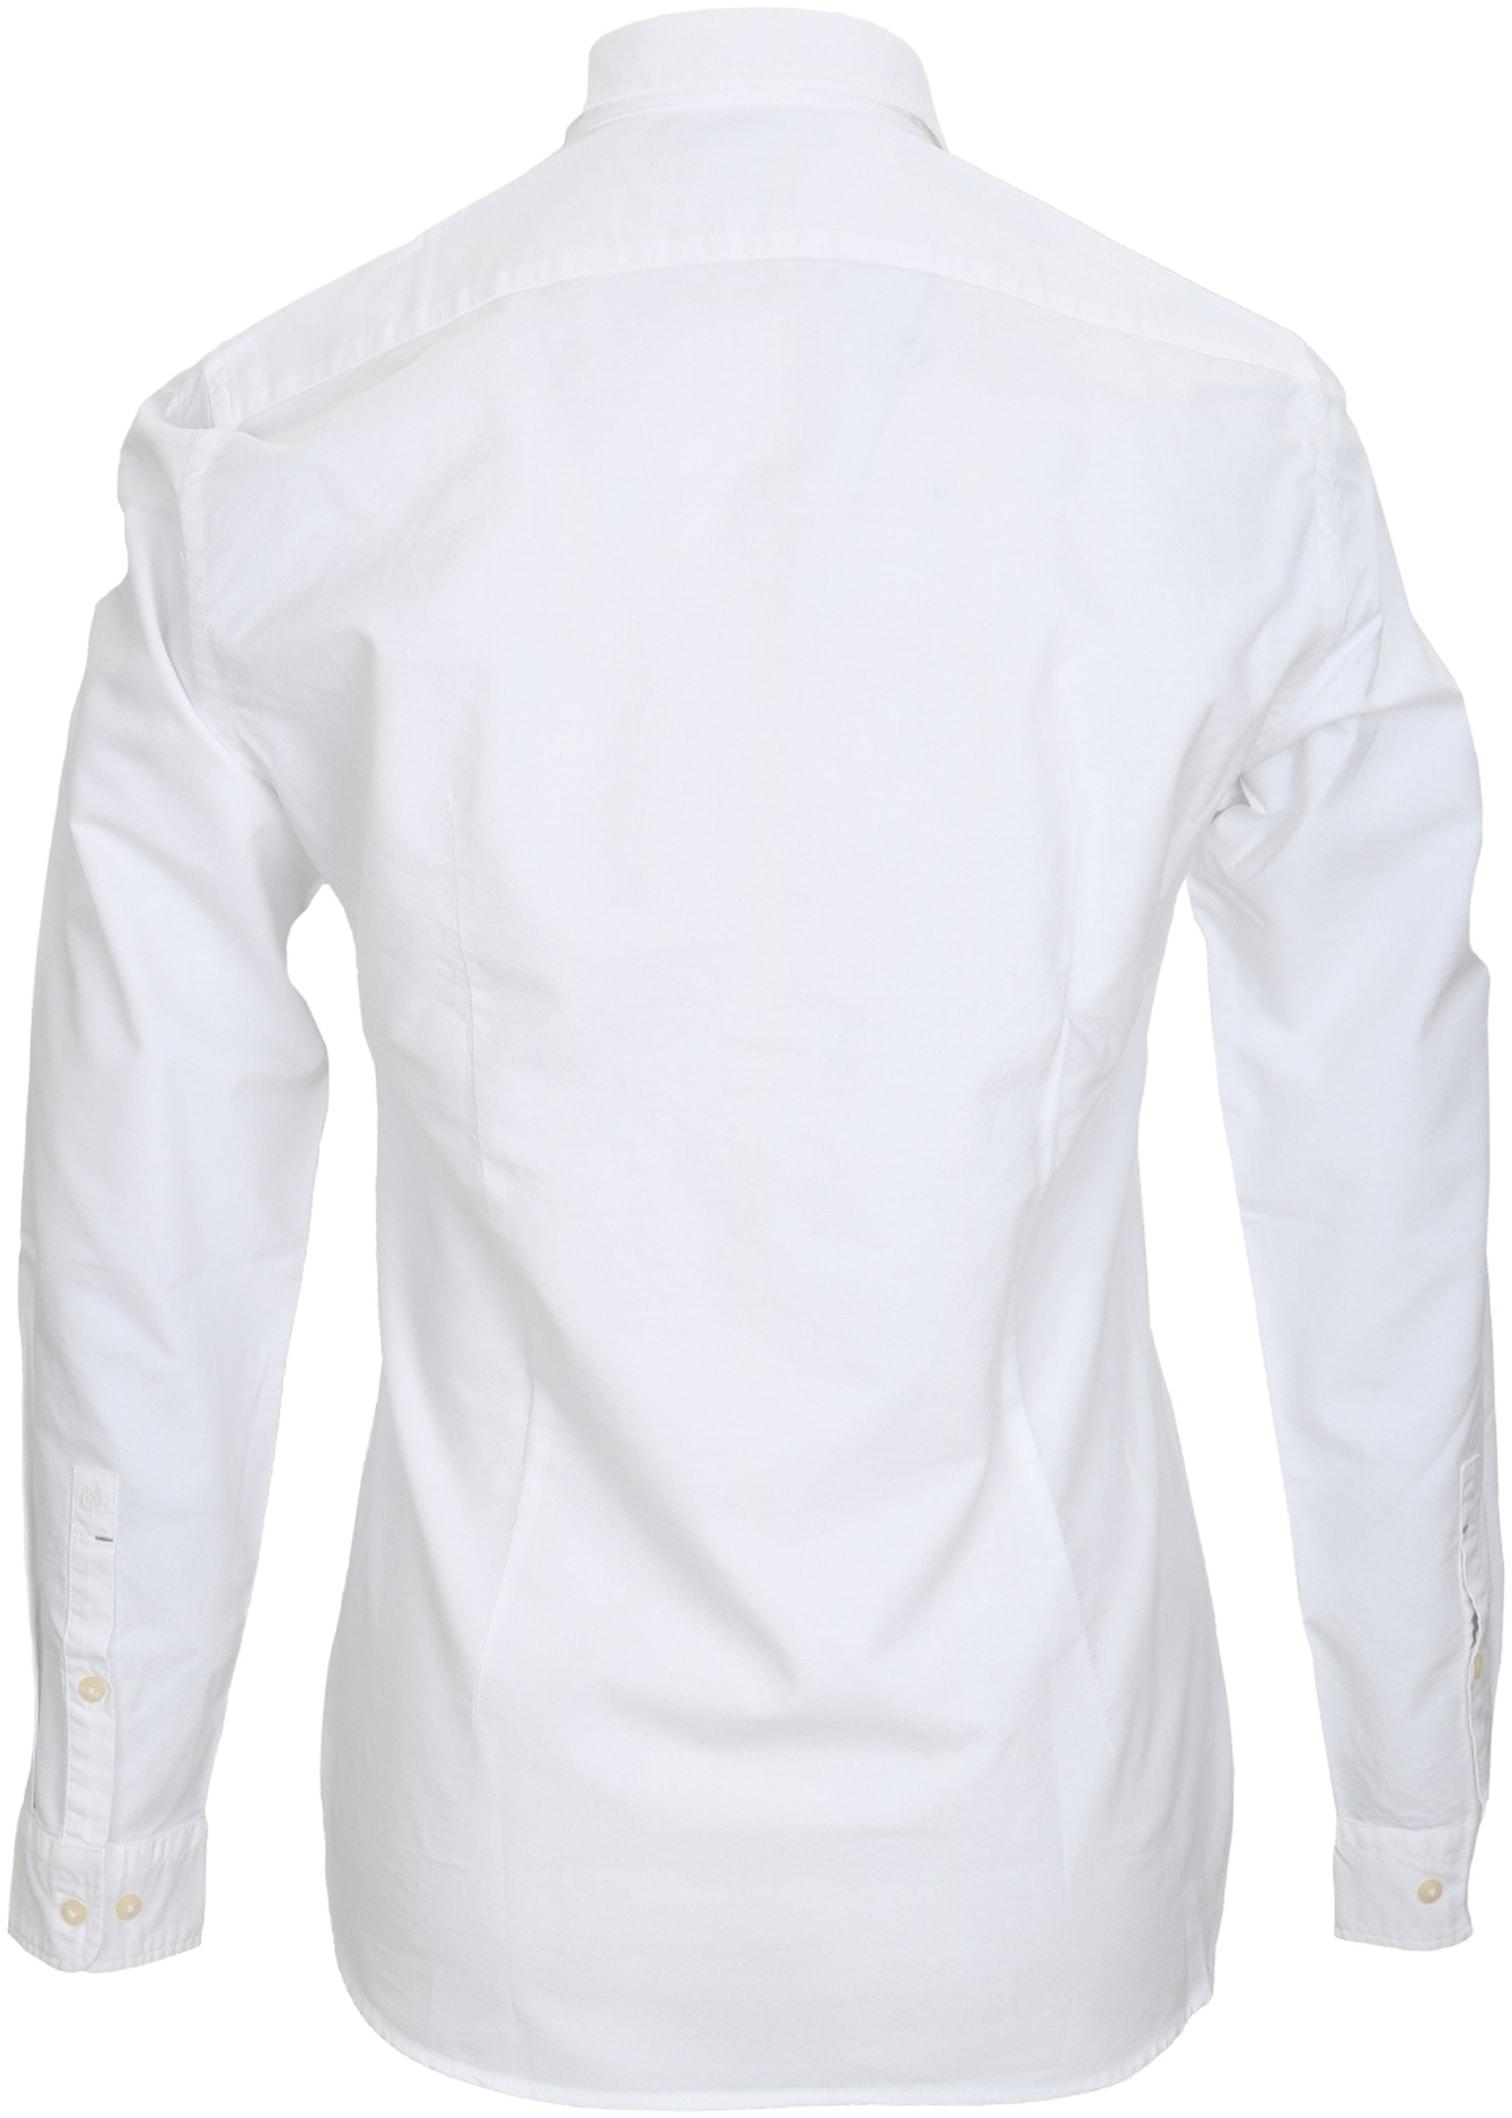 Marc O'Polo Overhemd Wit foto 3